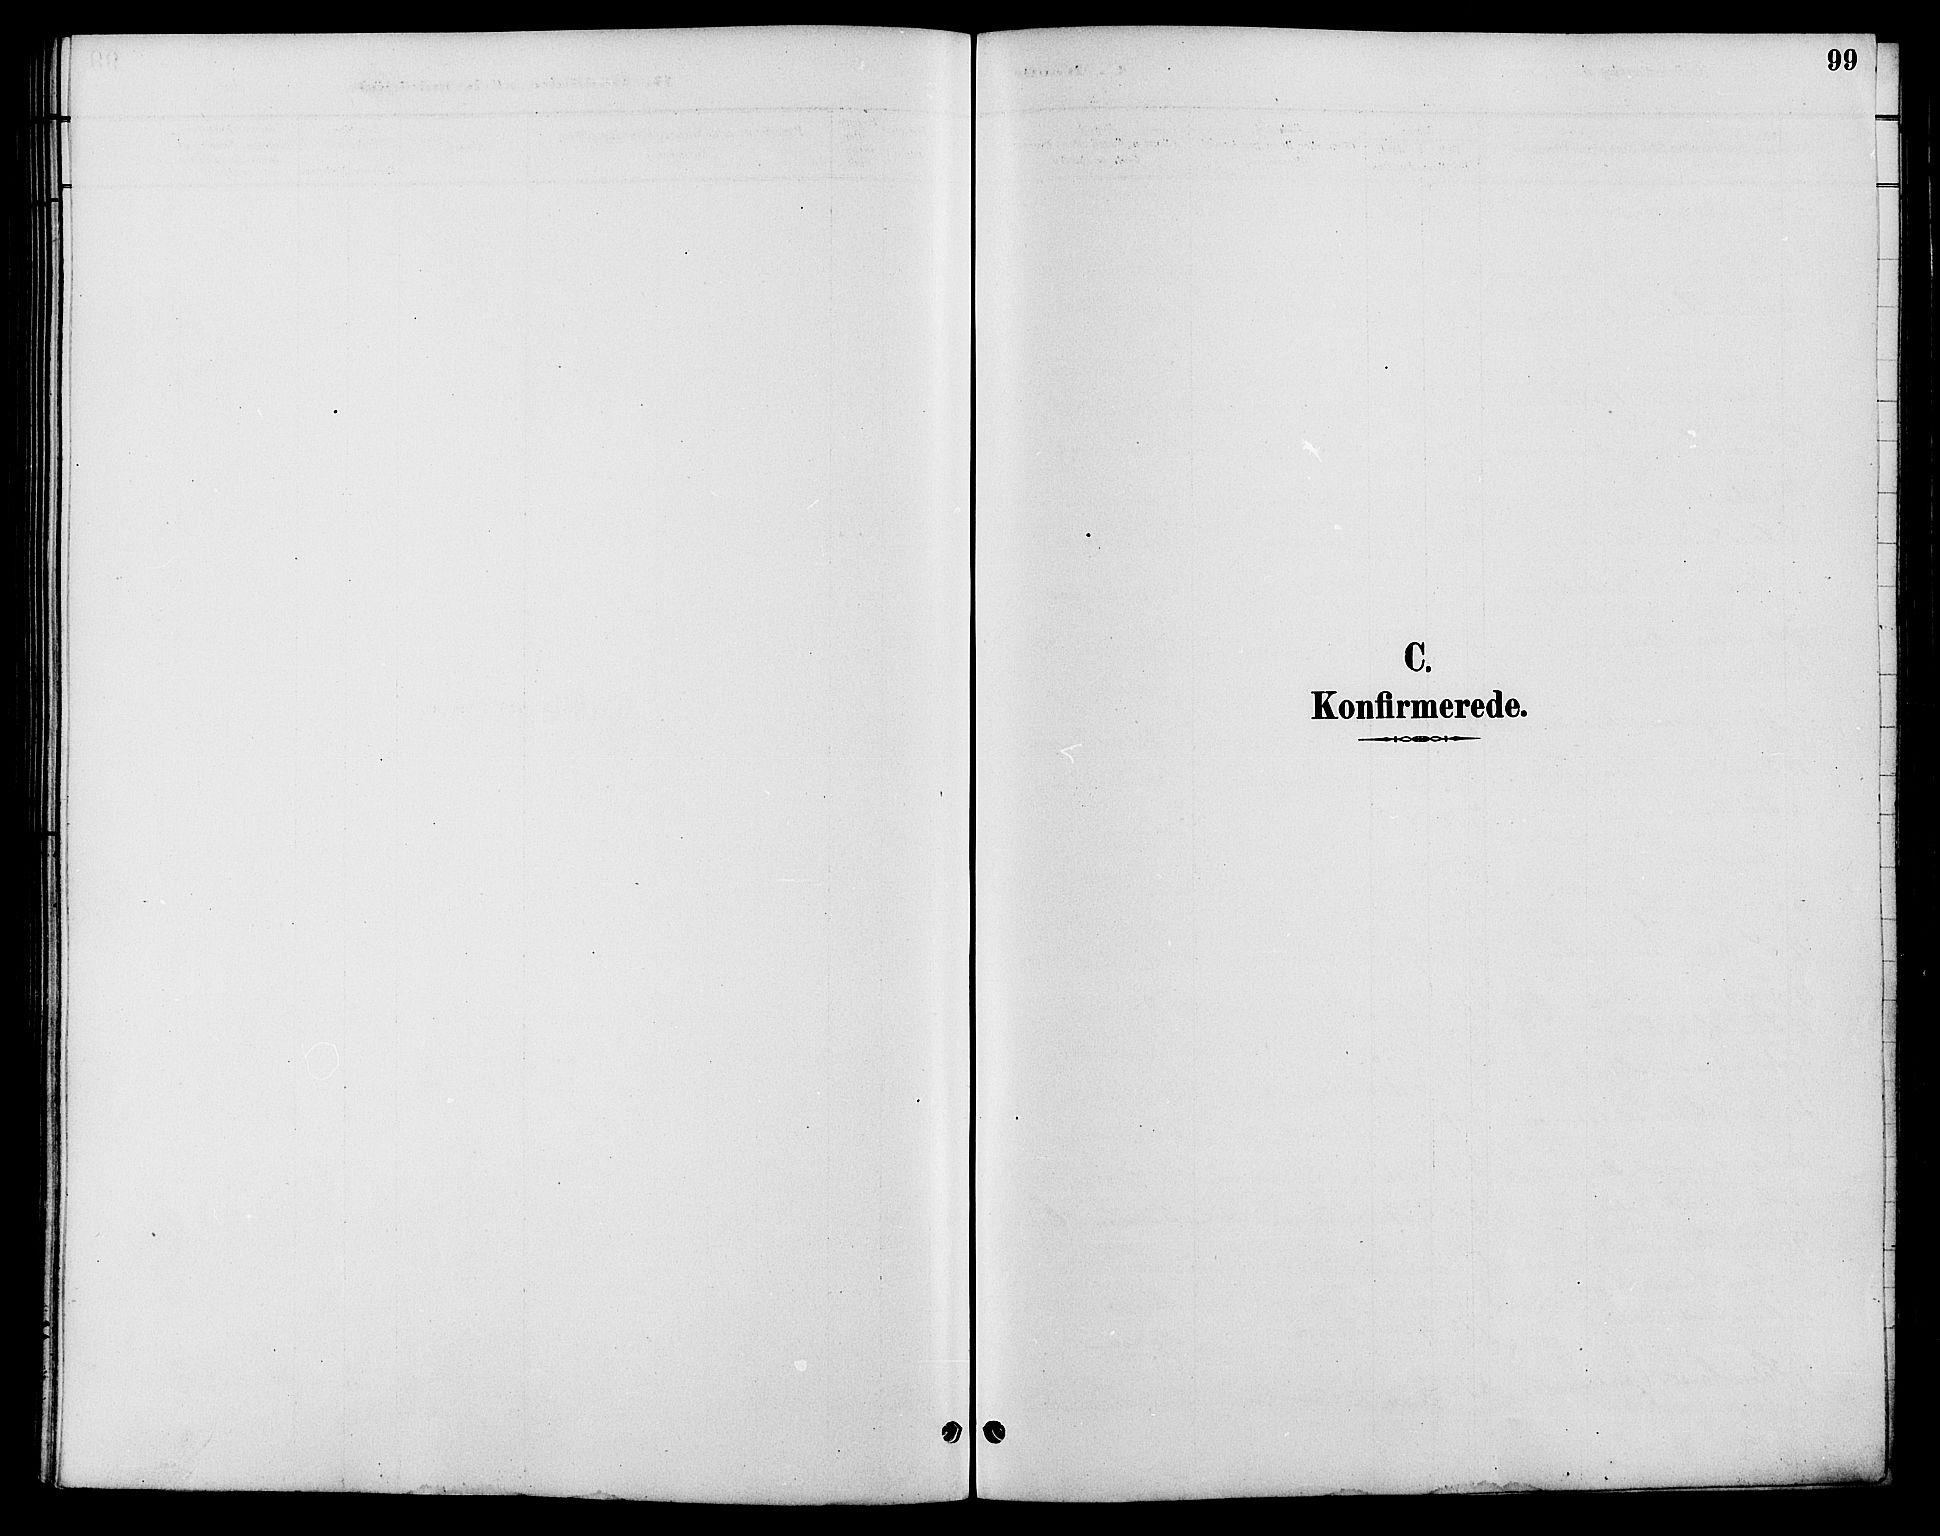 SAH, Nord-Fron prestekontor, Klokkerbok nr. 6, 1887-1914, s. 99